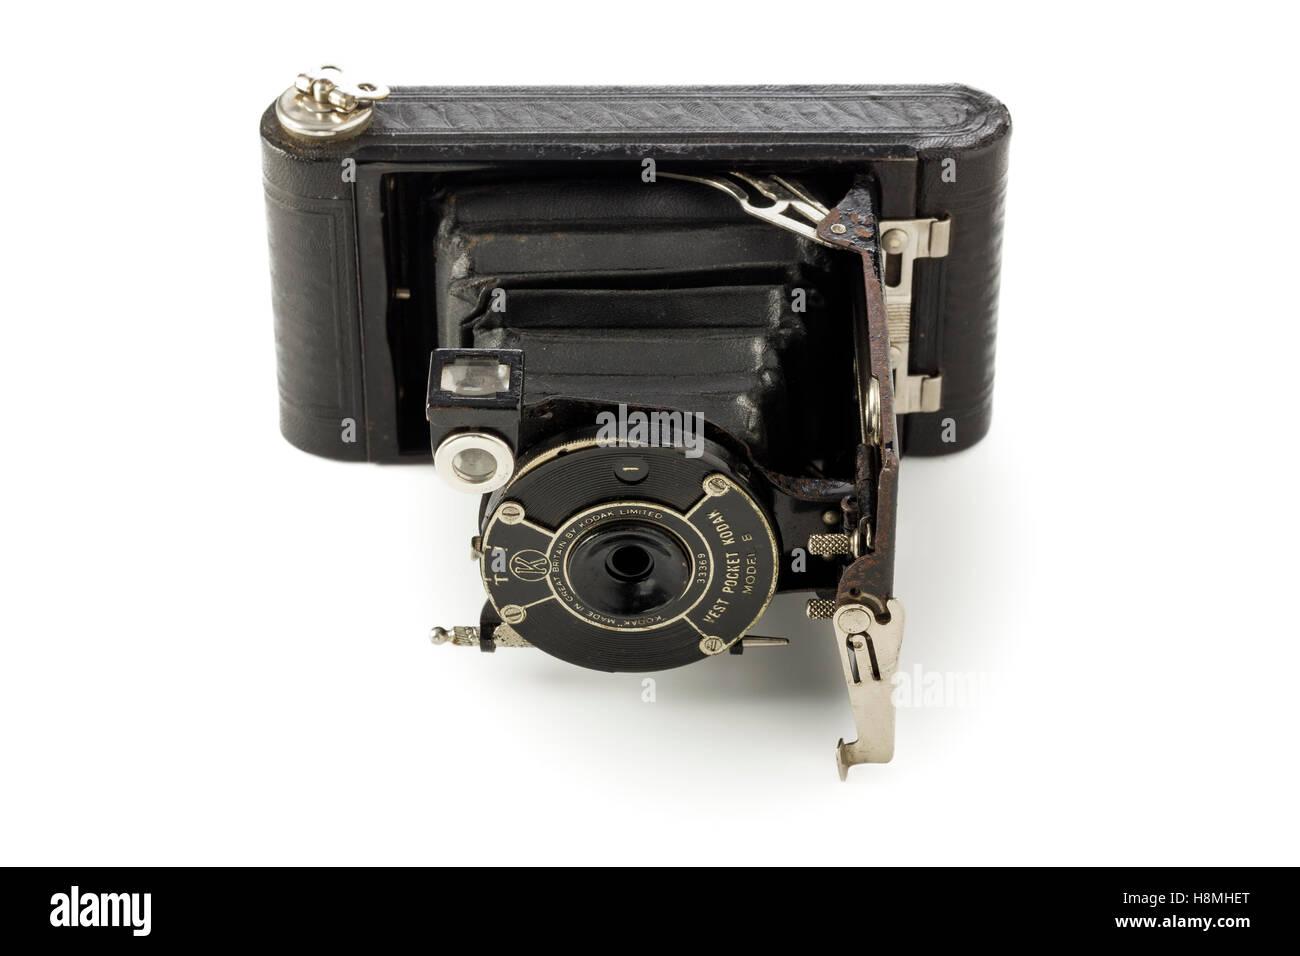 Kodak vest pocket model B vintage camera, produced by the Eastman Kodak  company 1925 - 1934 - Stock Image